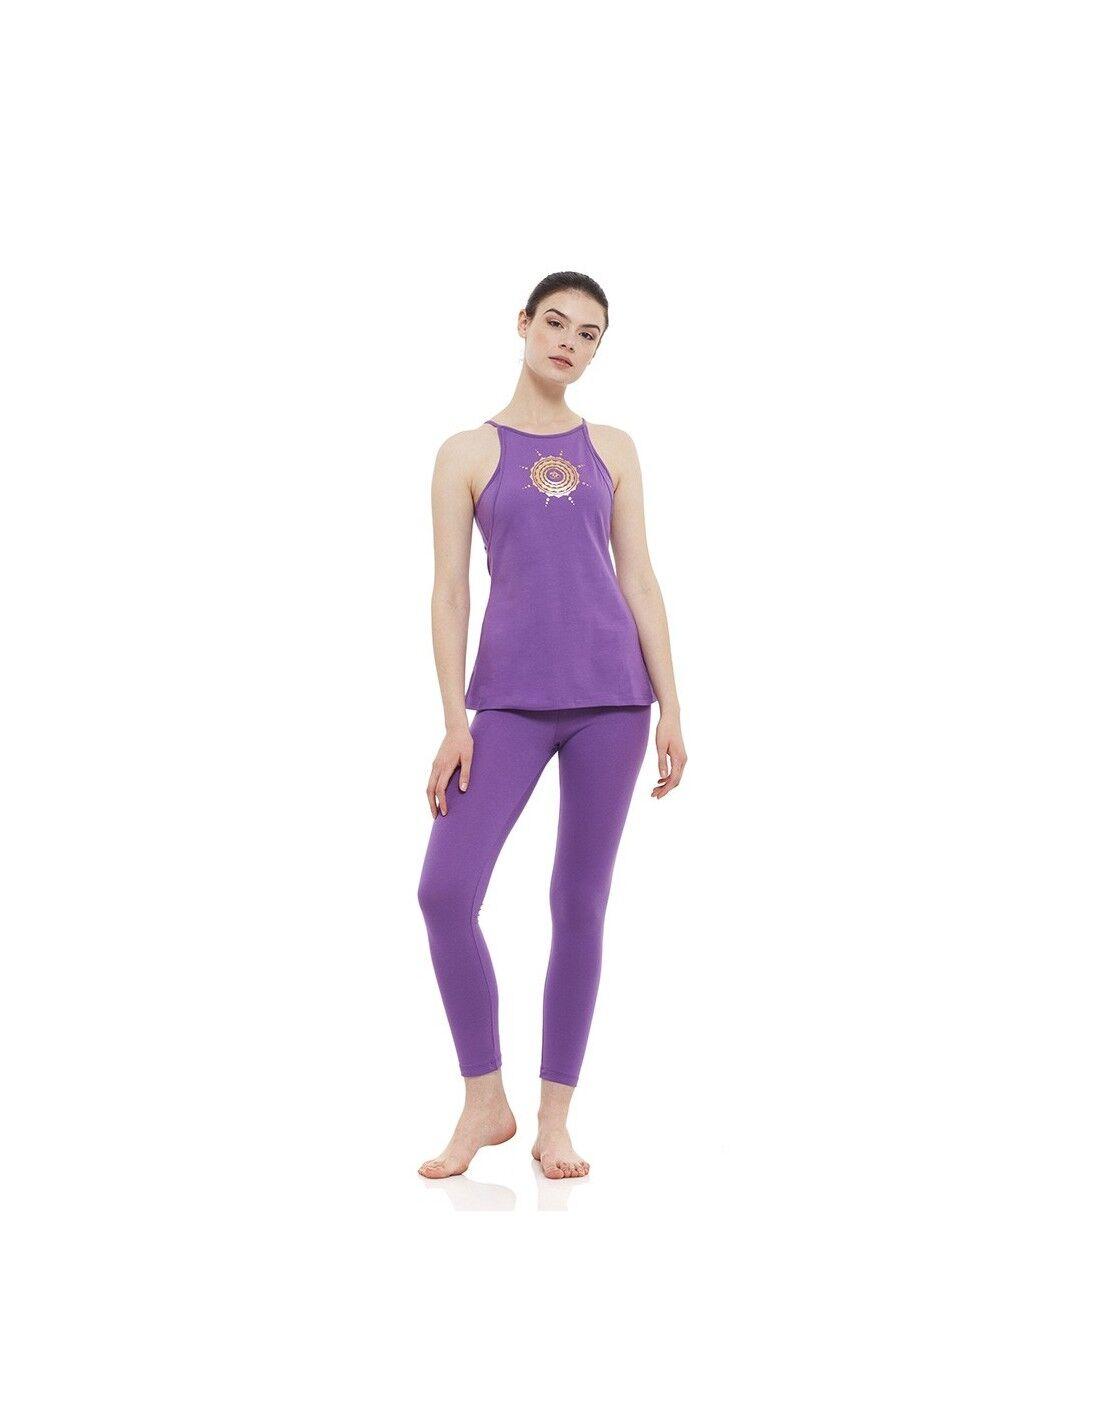 yogaessential completo sahasrara: canotta yoga shasrara + legging vita alta sahasrara (ametista)